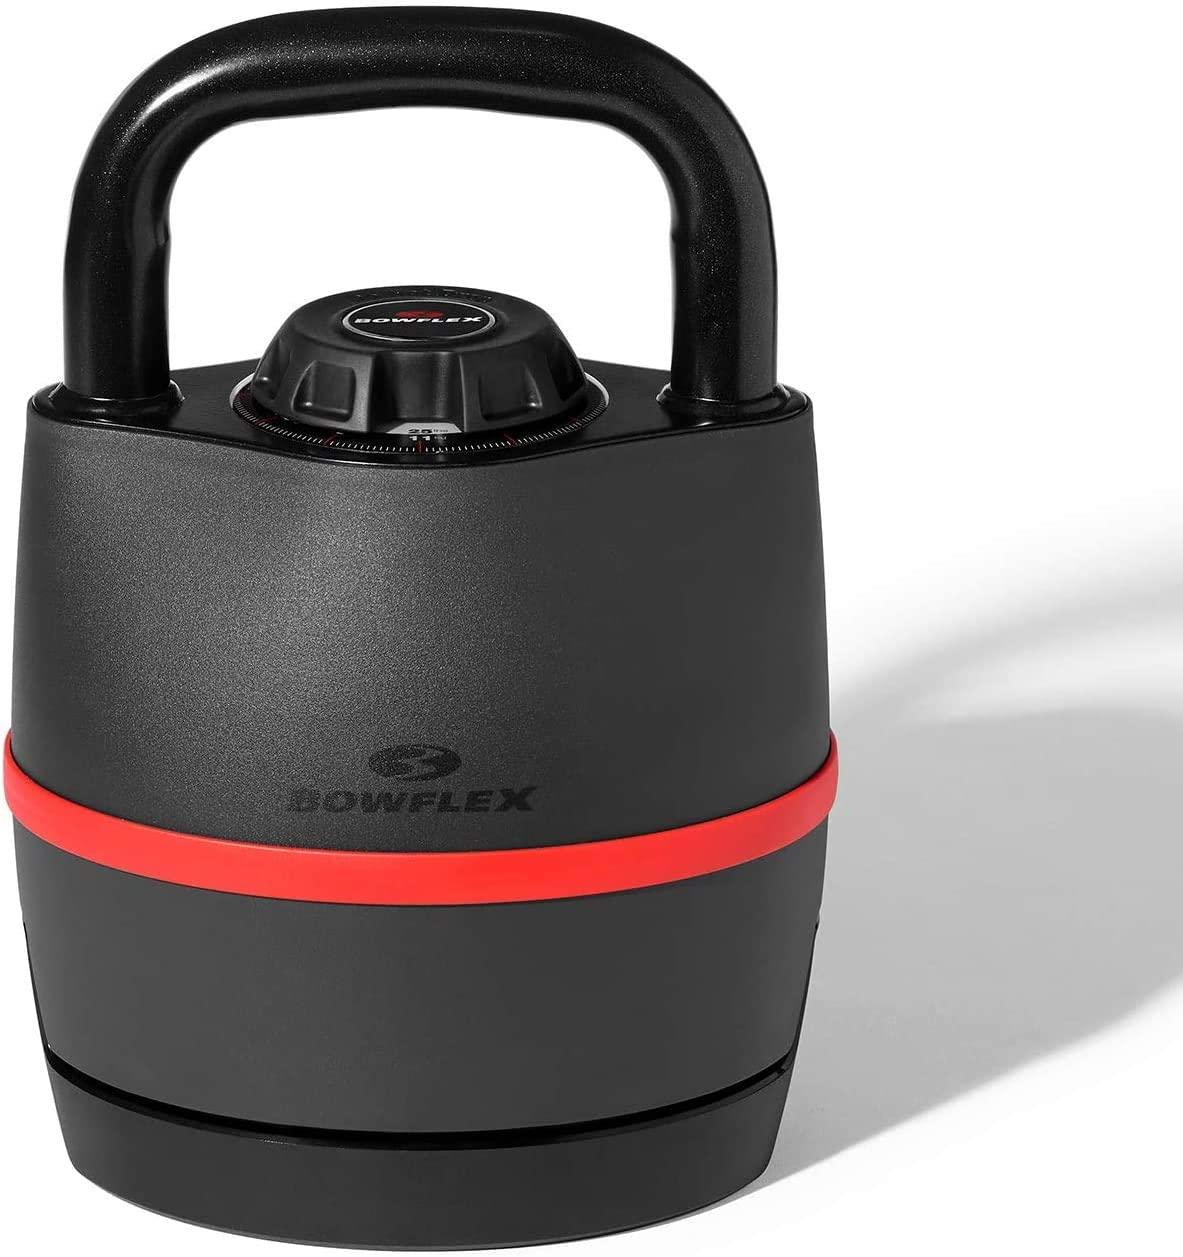 Bowflex Home Gym Series Kettlebell